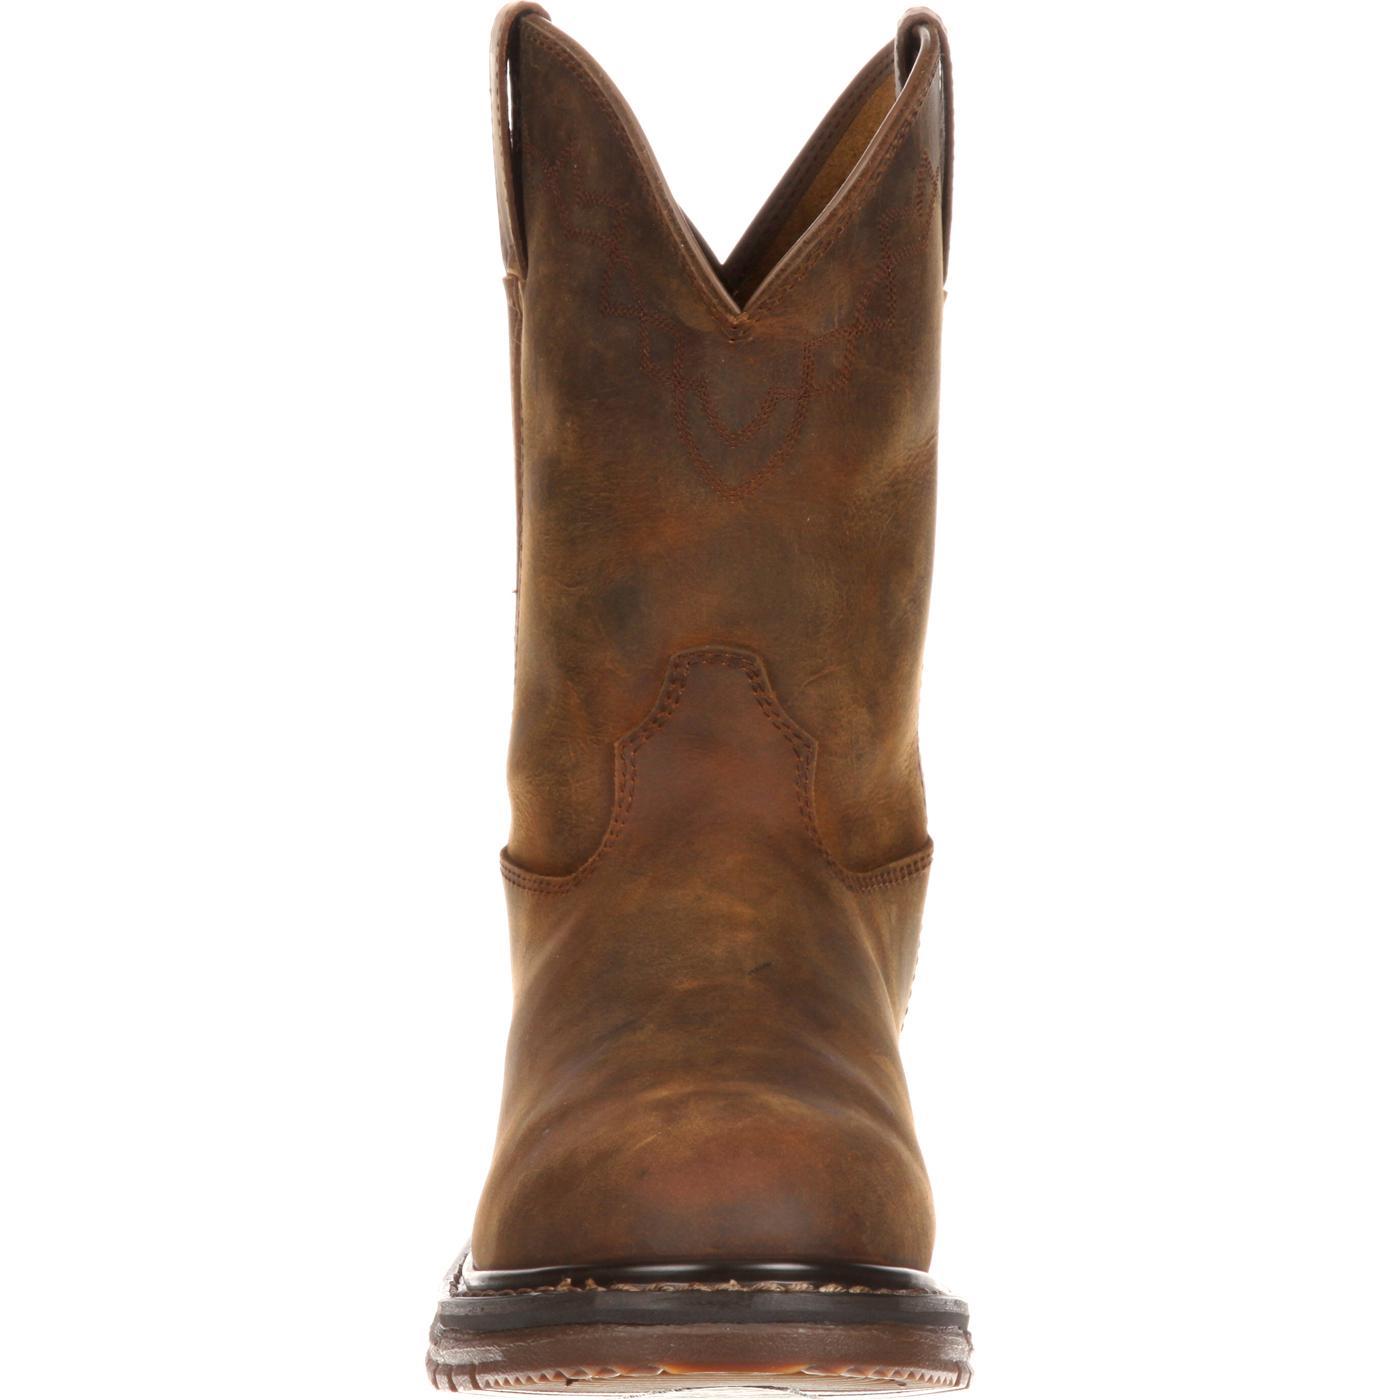 8c208fd3267 Rocky Original Ride Roper Western Boot